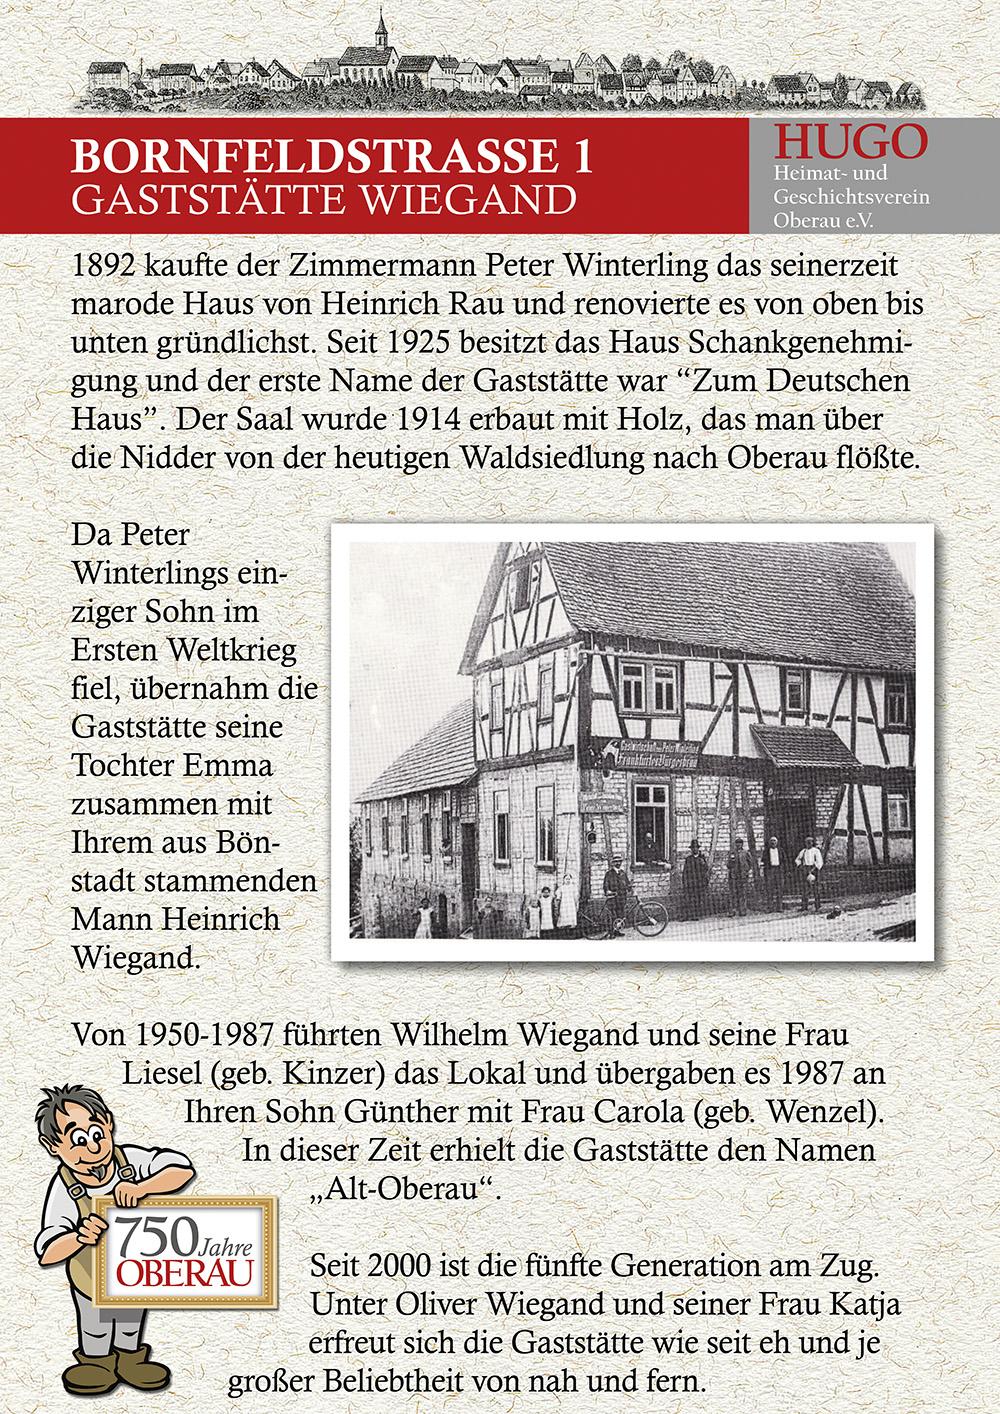 Bornfeldstraße 1 - Gaststätte Wiegand